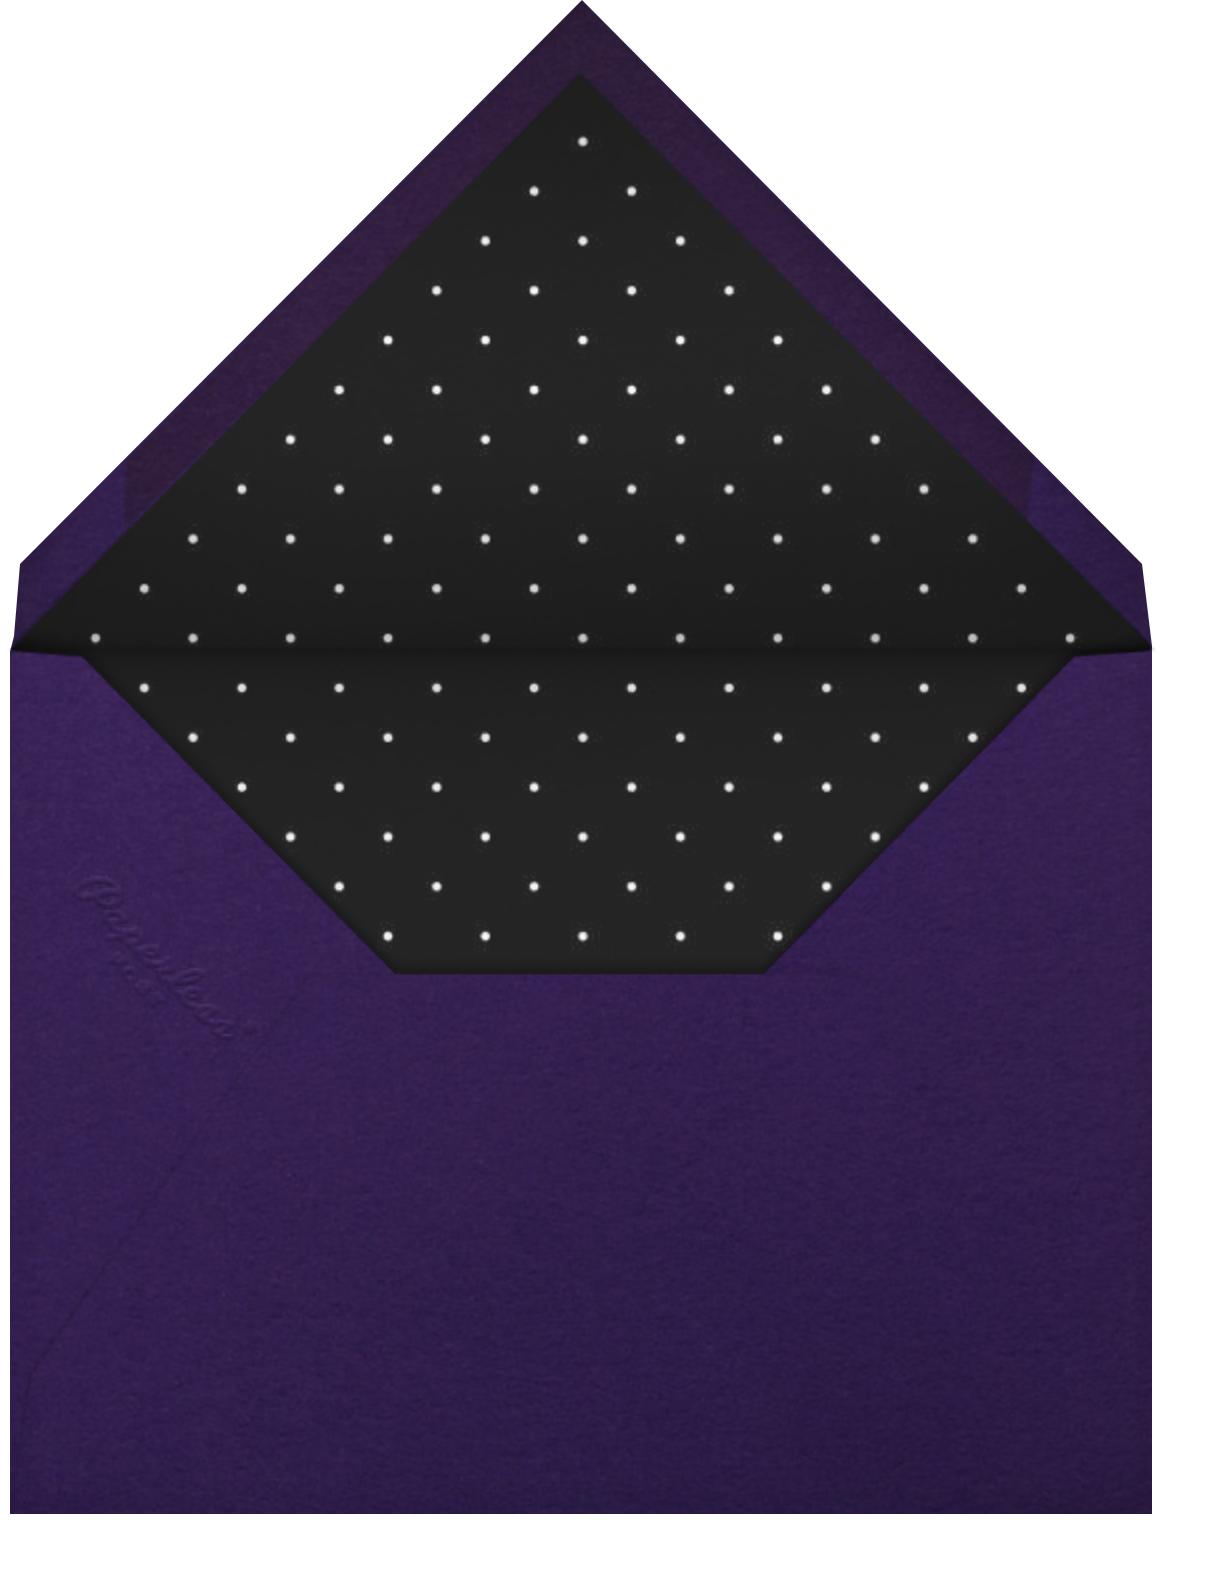 Cadogan - Cream/Black - Paperless Post - Graduation party - envelope back